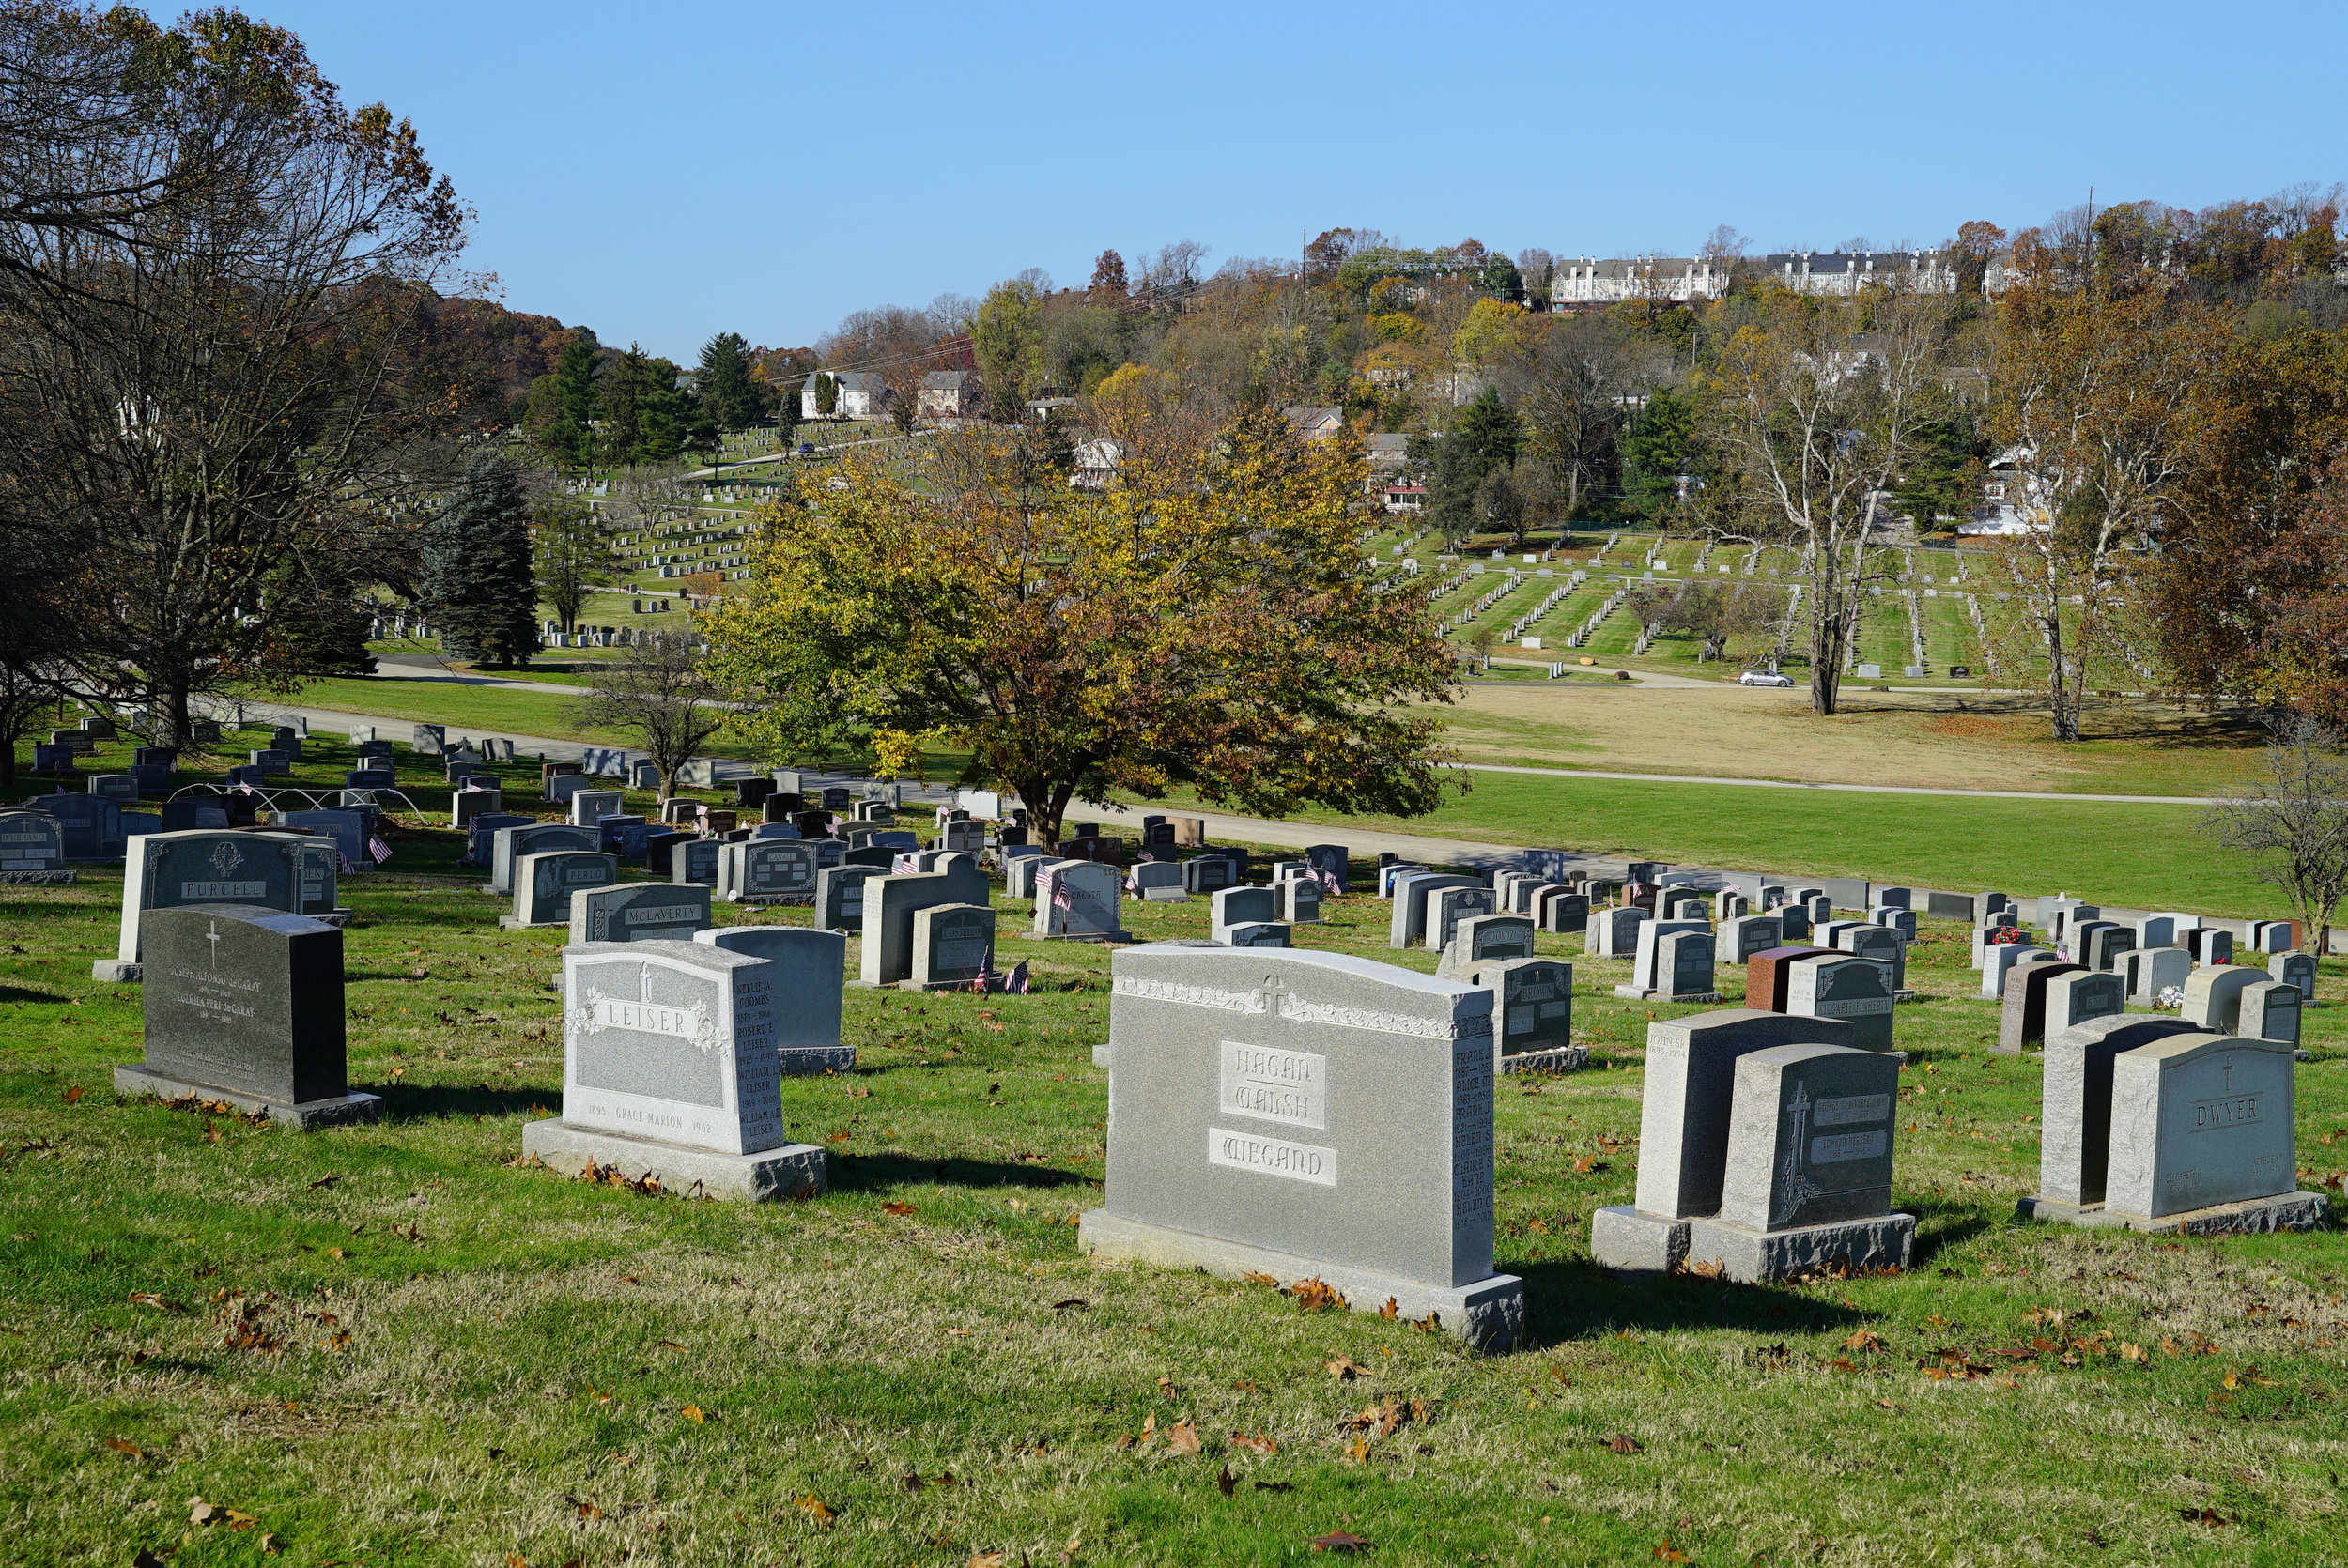 Calvary Cemetery. West Conshohocken, Pennsylvania. November 11, 2018